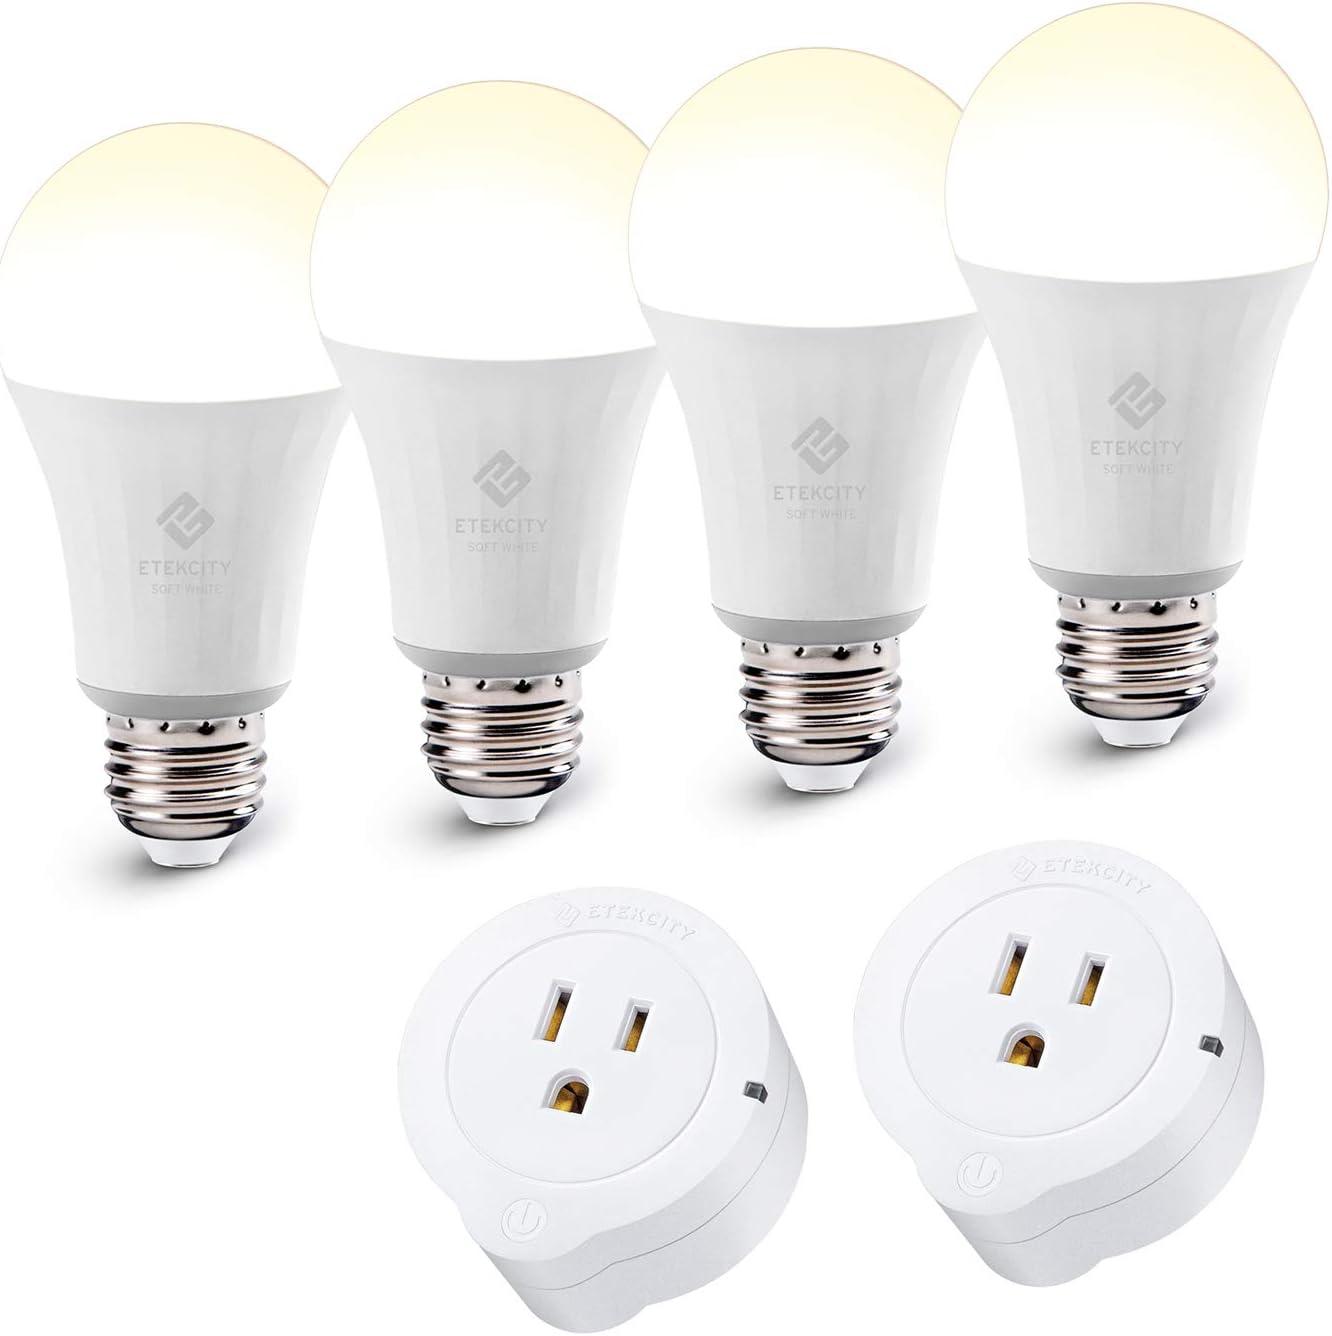 Etekcity Smart Plug and Smart Bulb Works with Alexa, Google Home & IFTTT